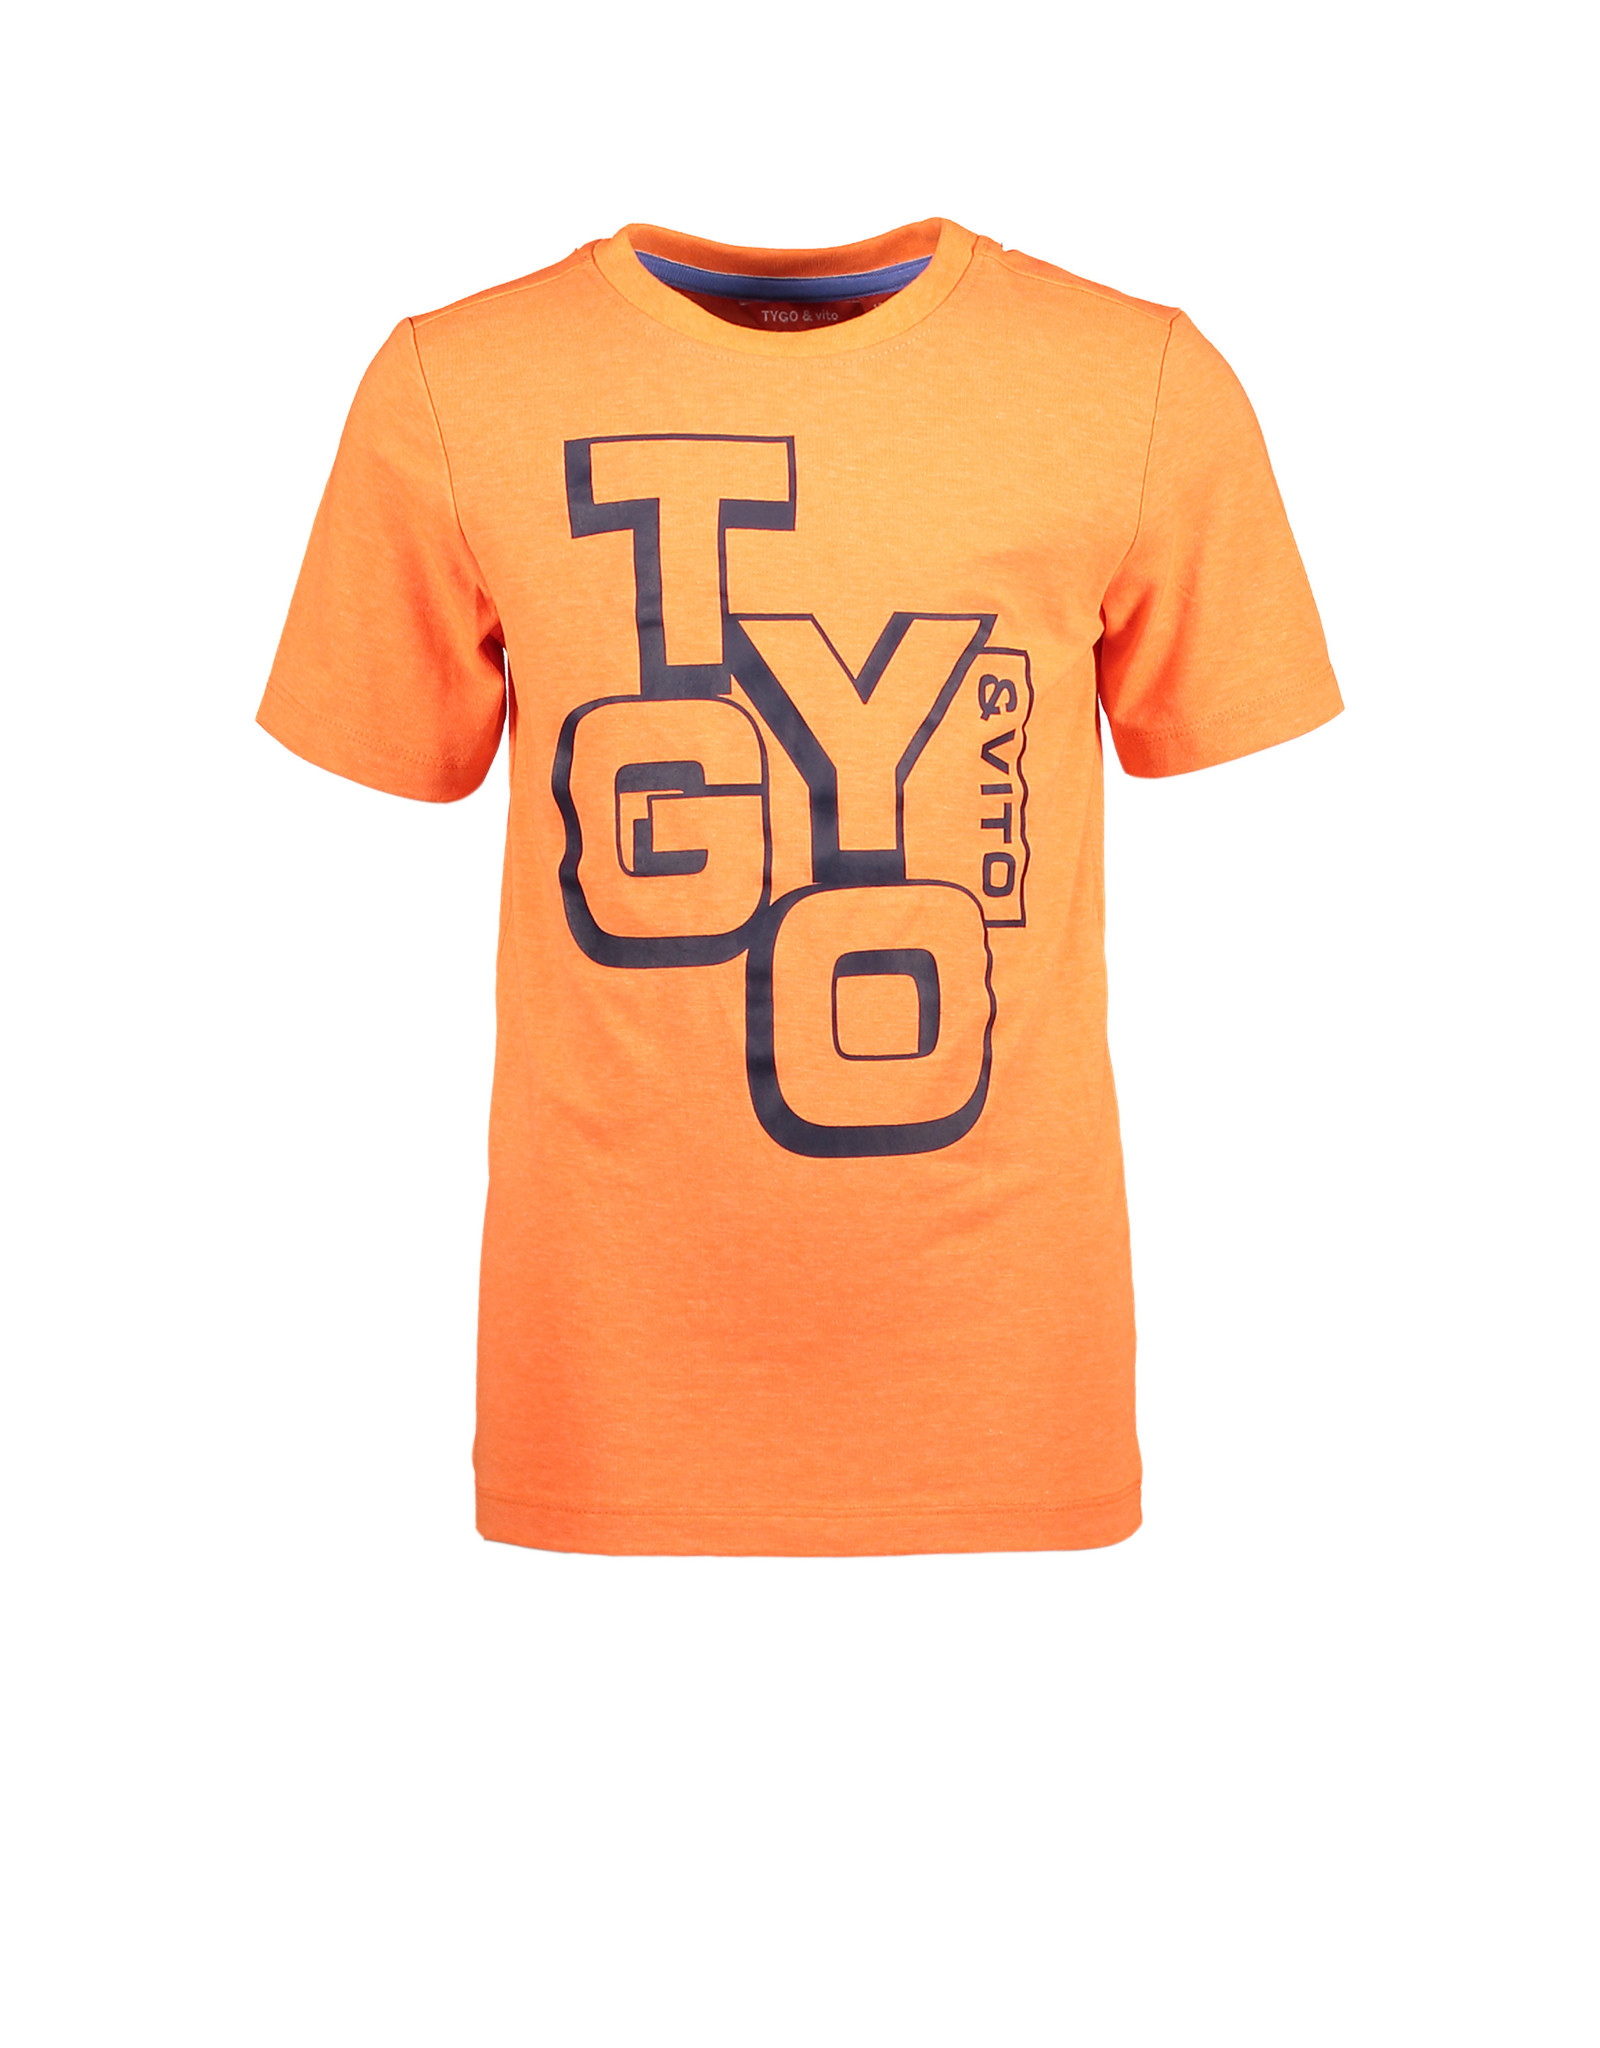 Tygo & Vito T&v neon T-shirt LOGO orange